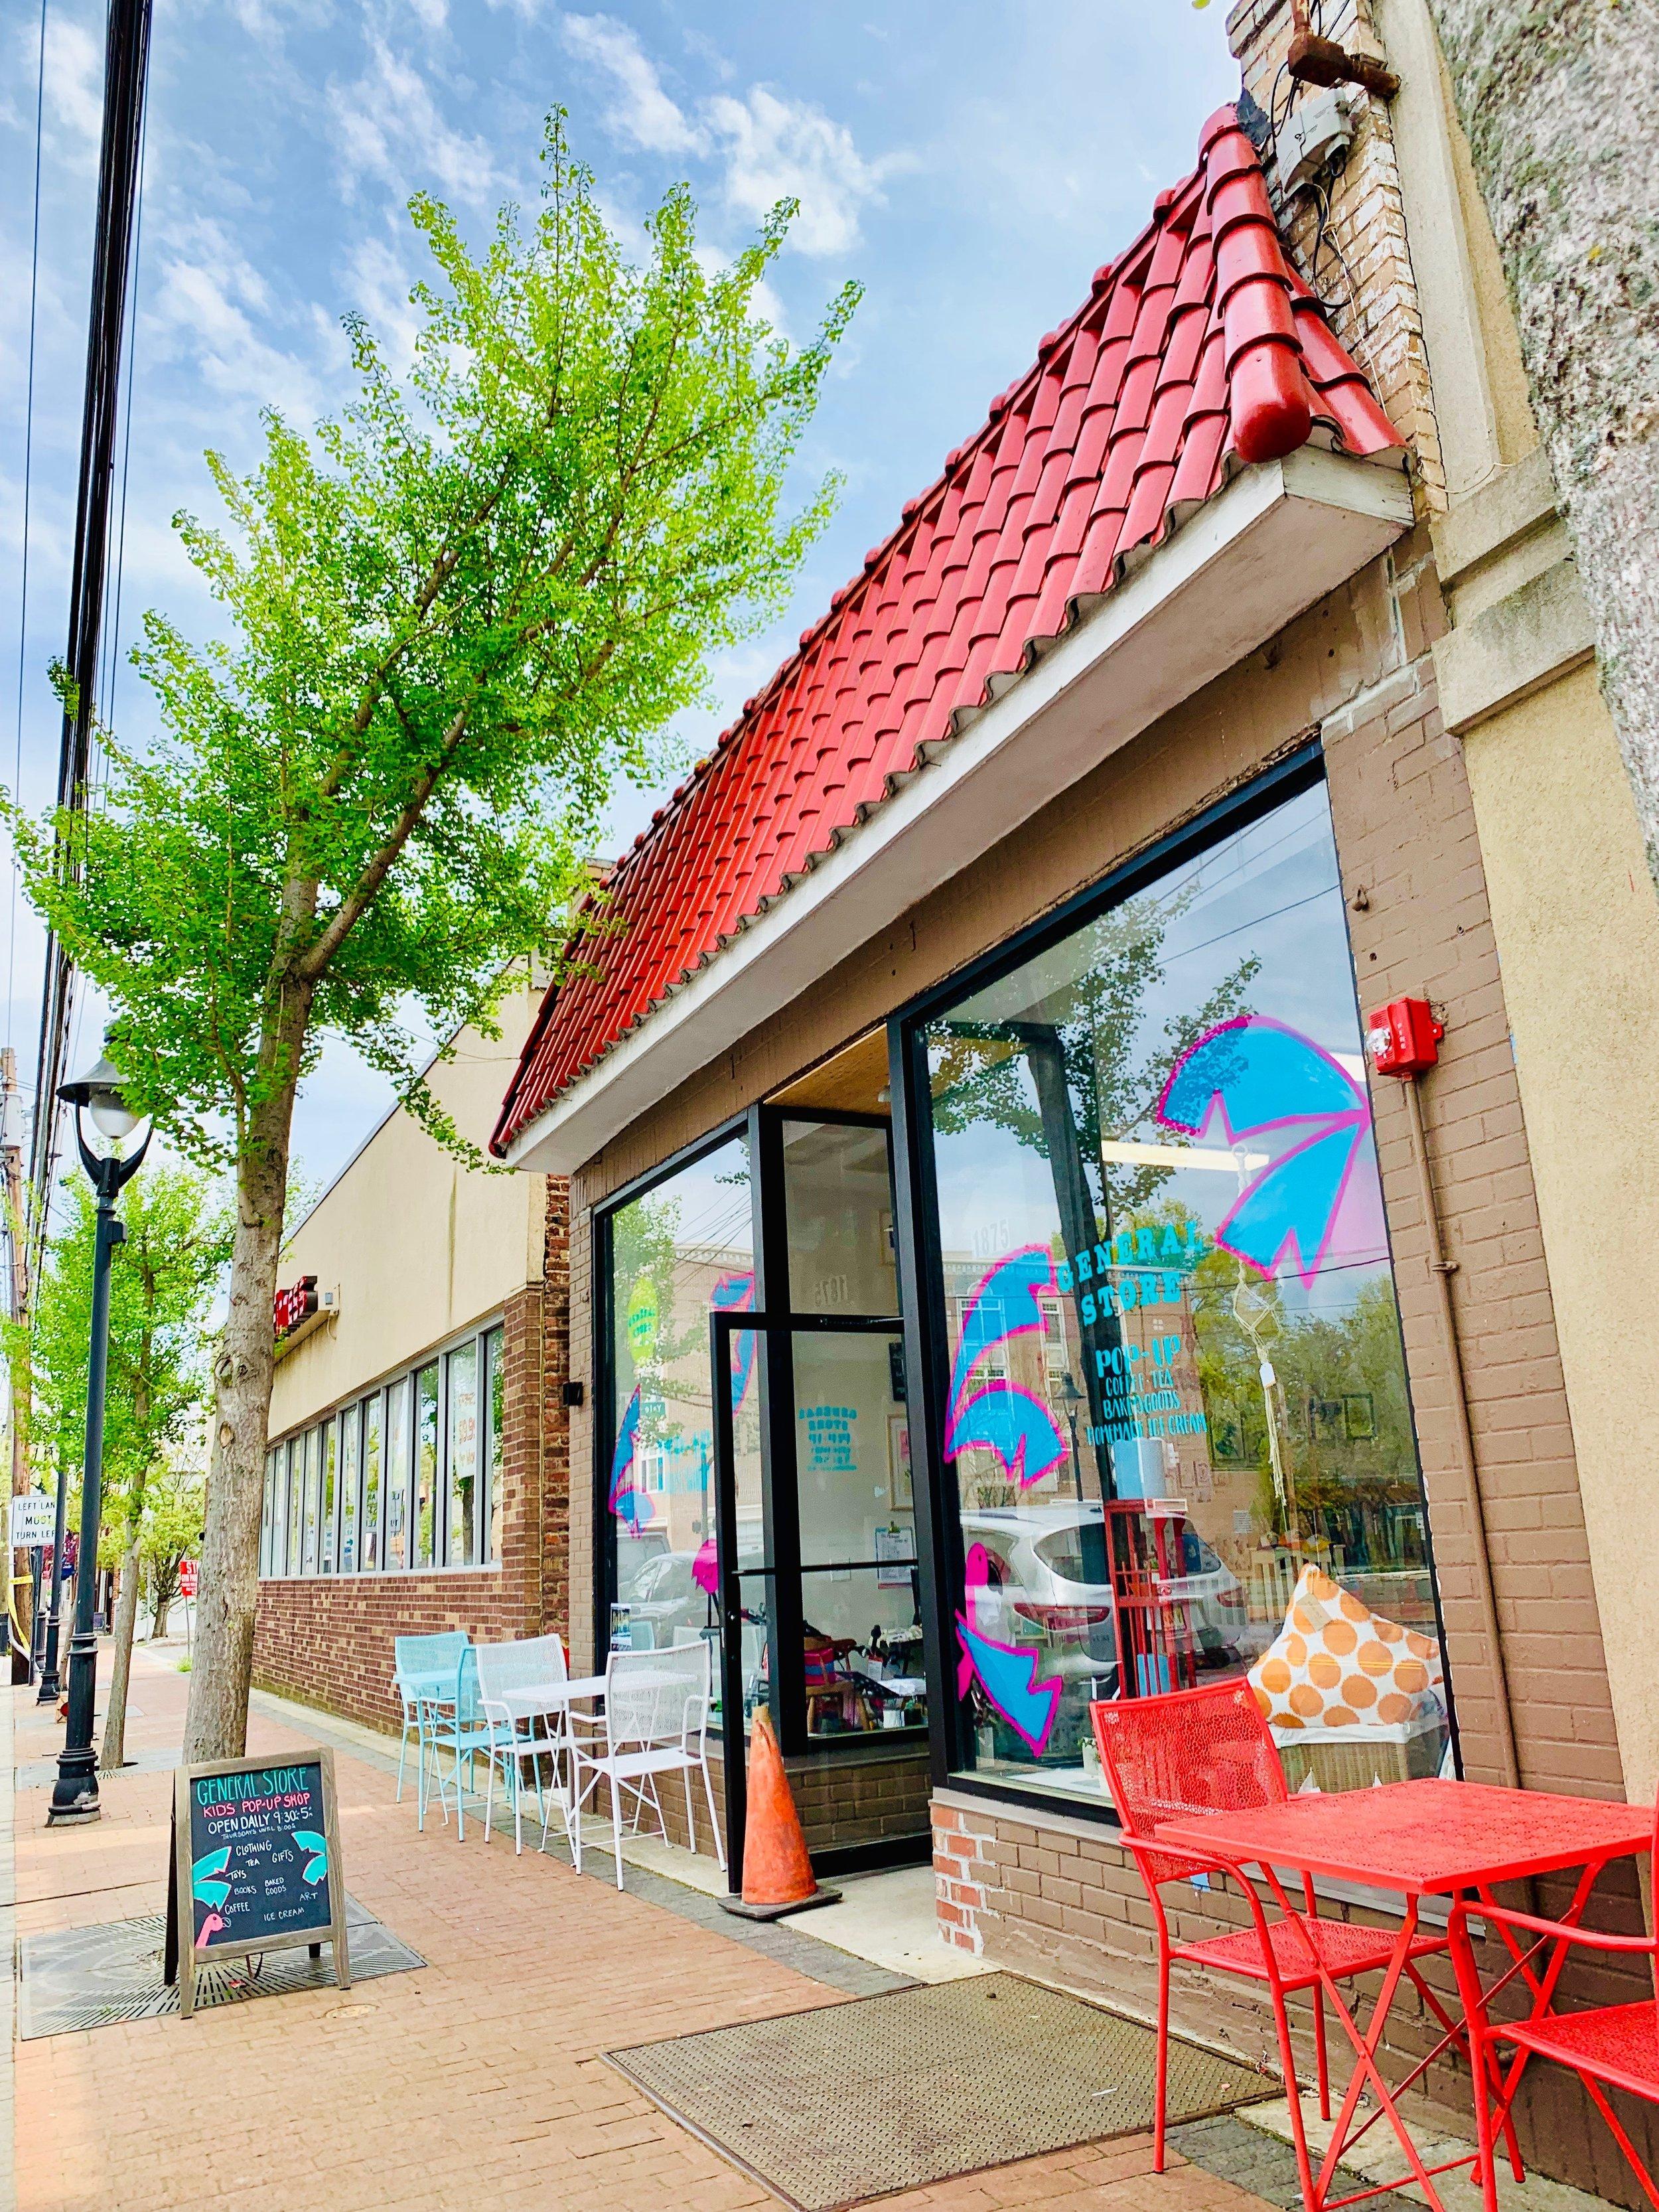 Pop Up Kids Shop, 1875 Springfield Ave, Maplewood, NJ